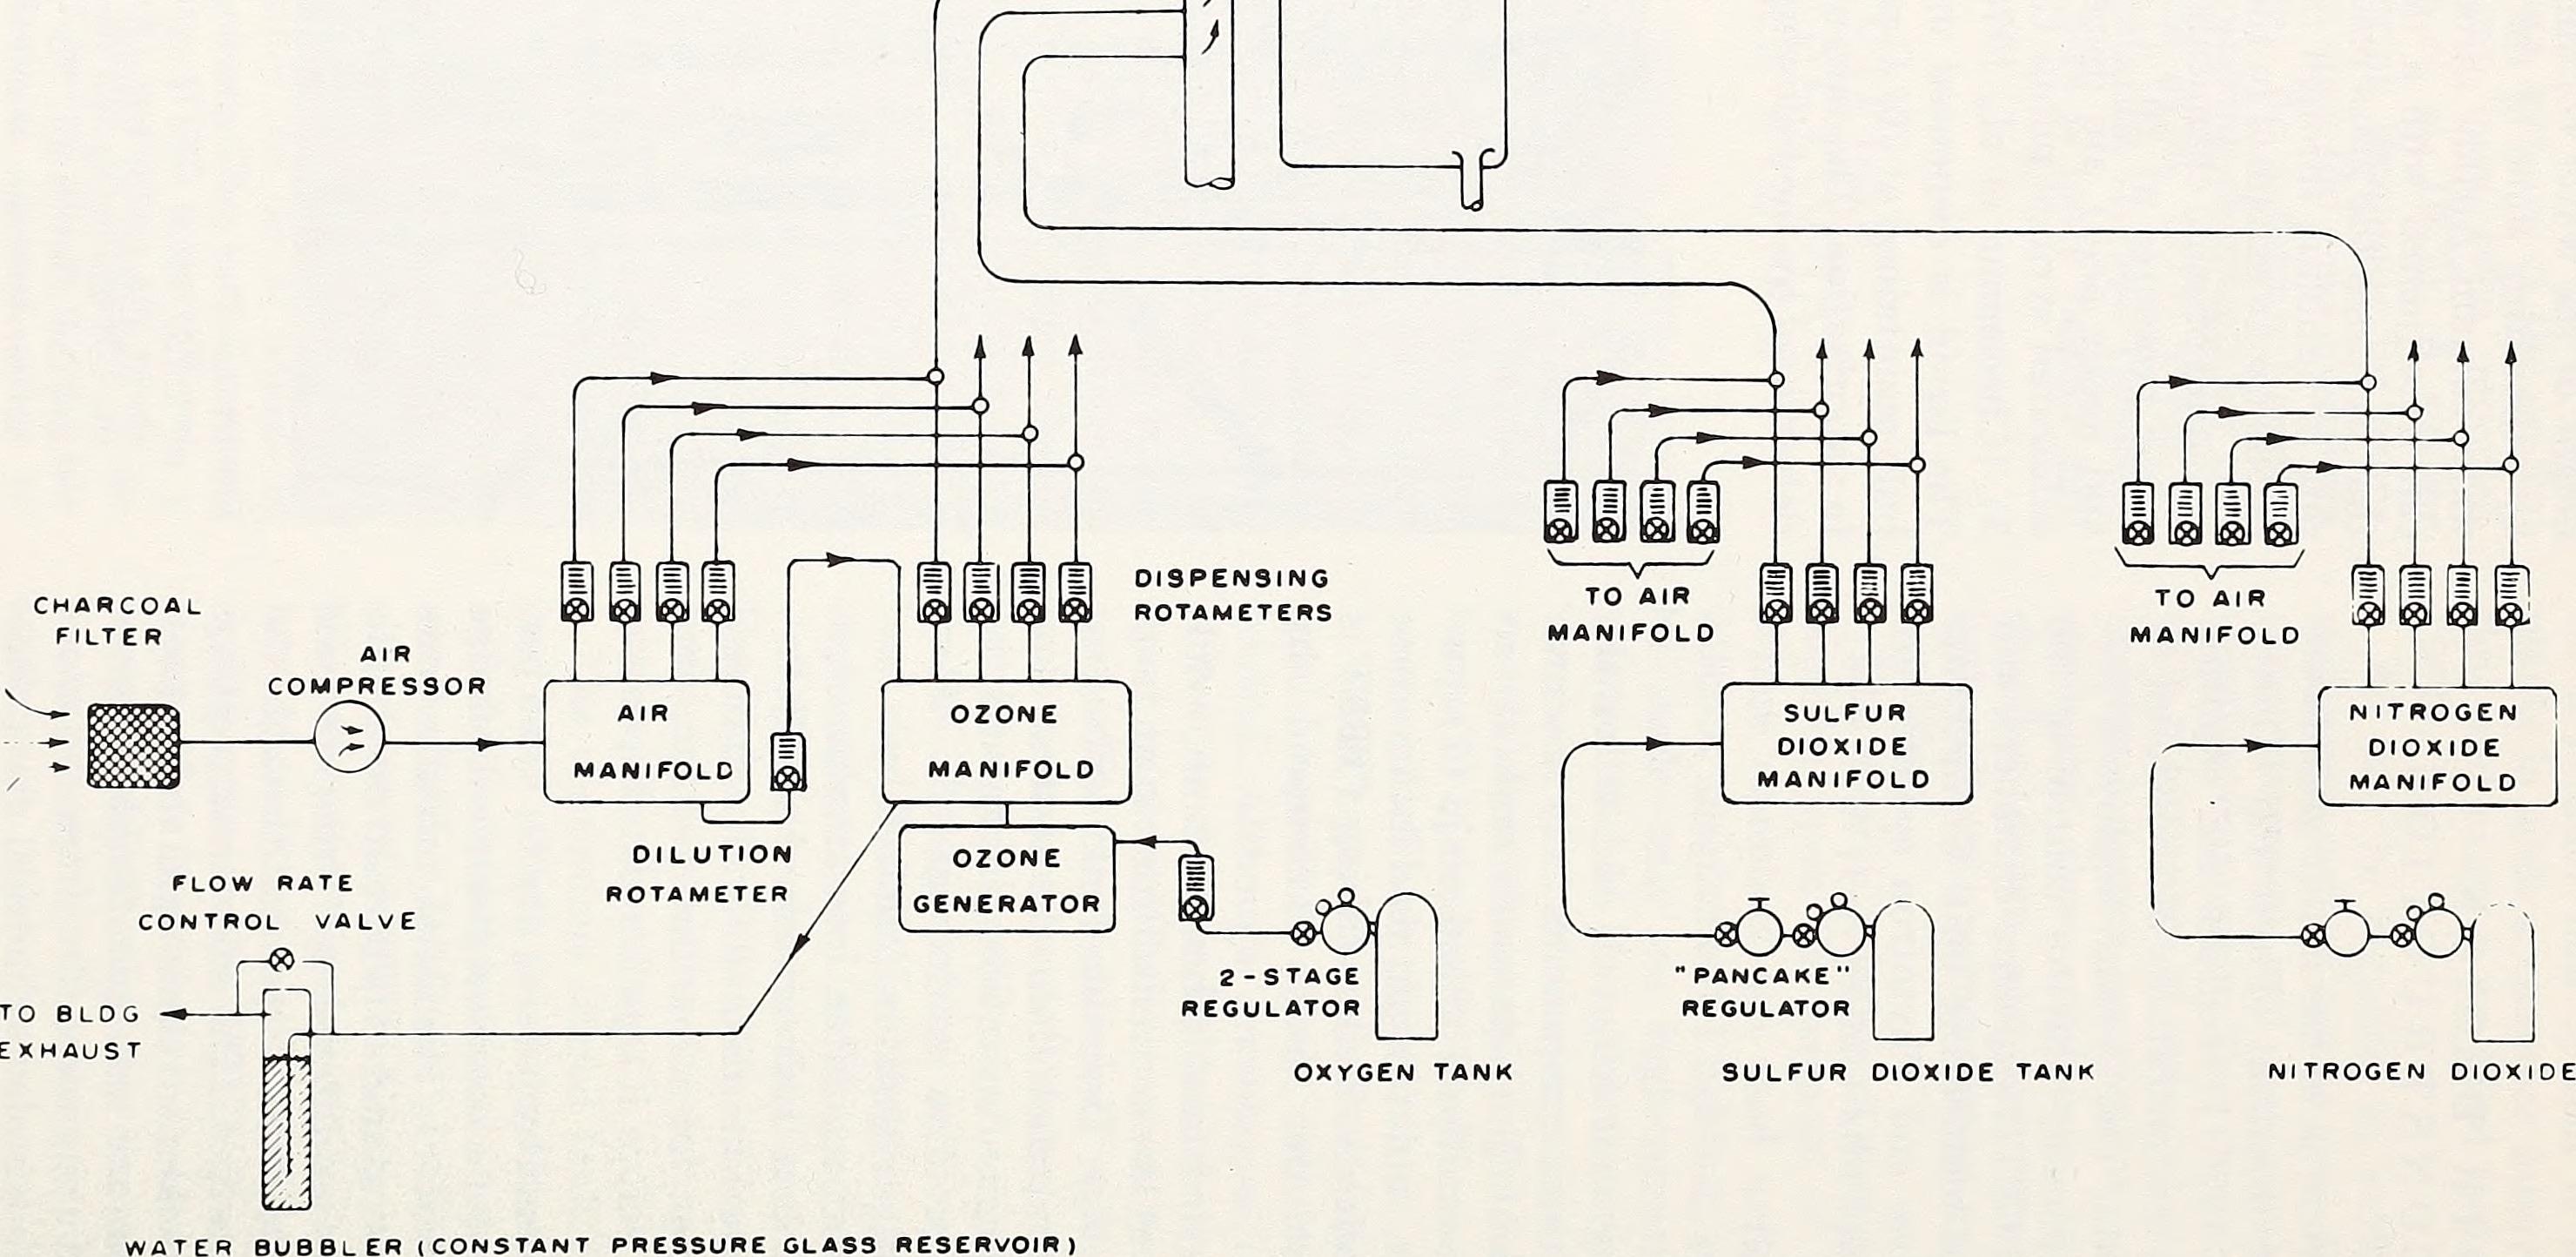 FileA Continuous Stirred Tank Reactor CSTR System For Exposing - Cstr reactor design